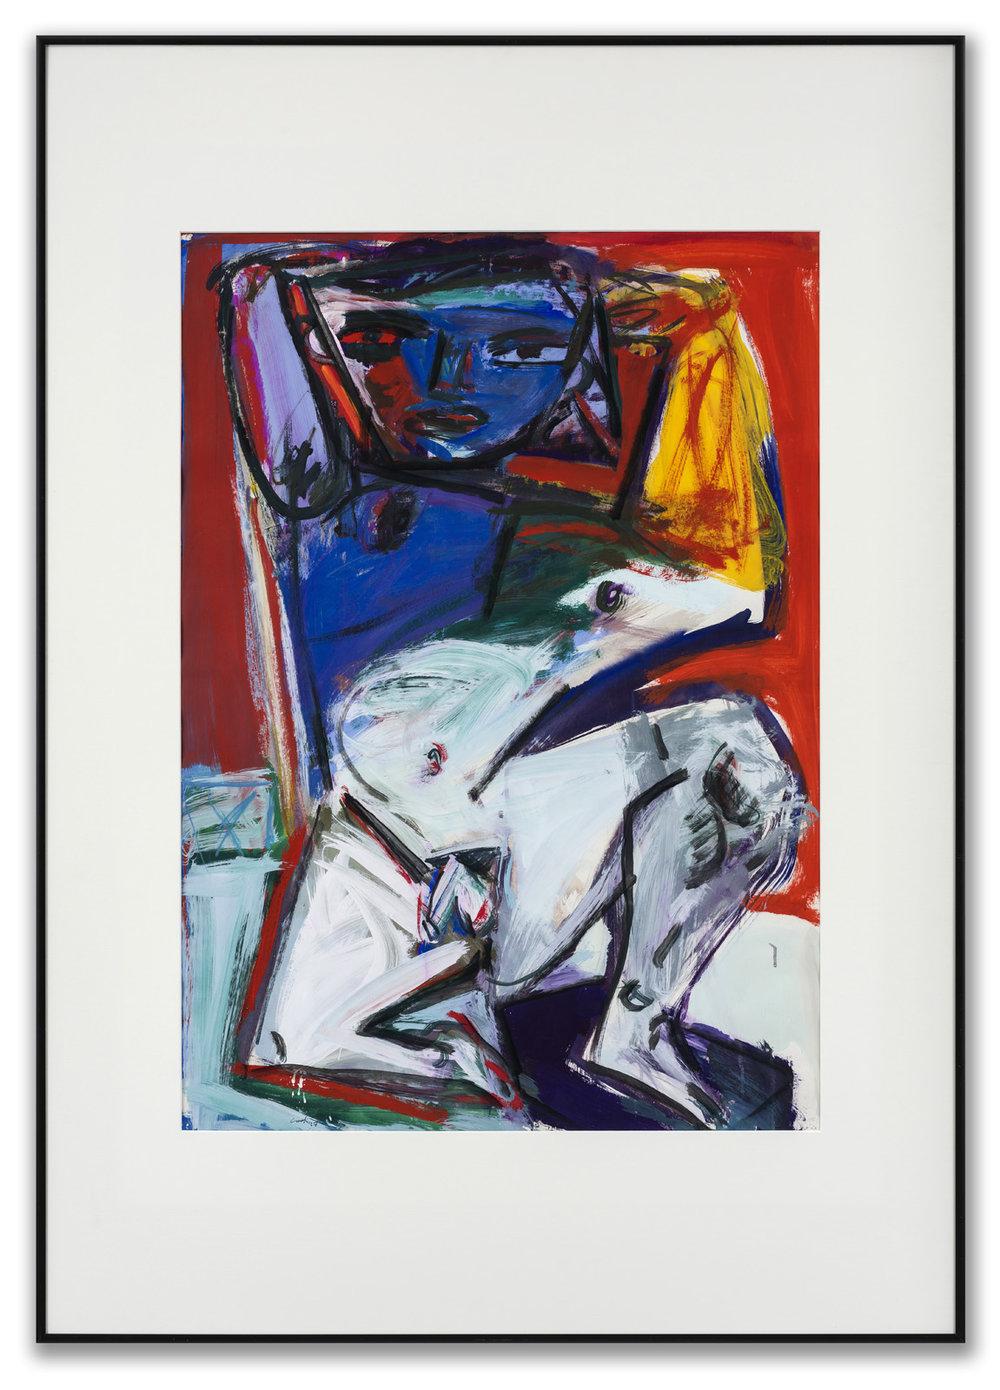 Ian Cook, R.S.W., (Scottish b. 1951), Dancer I, 2017.